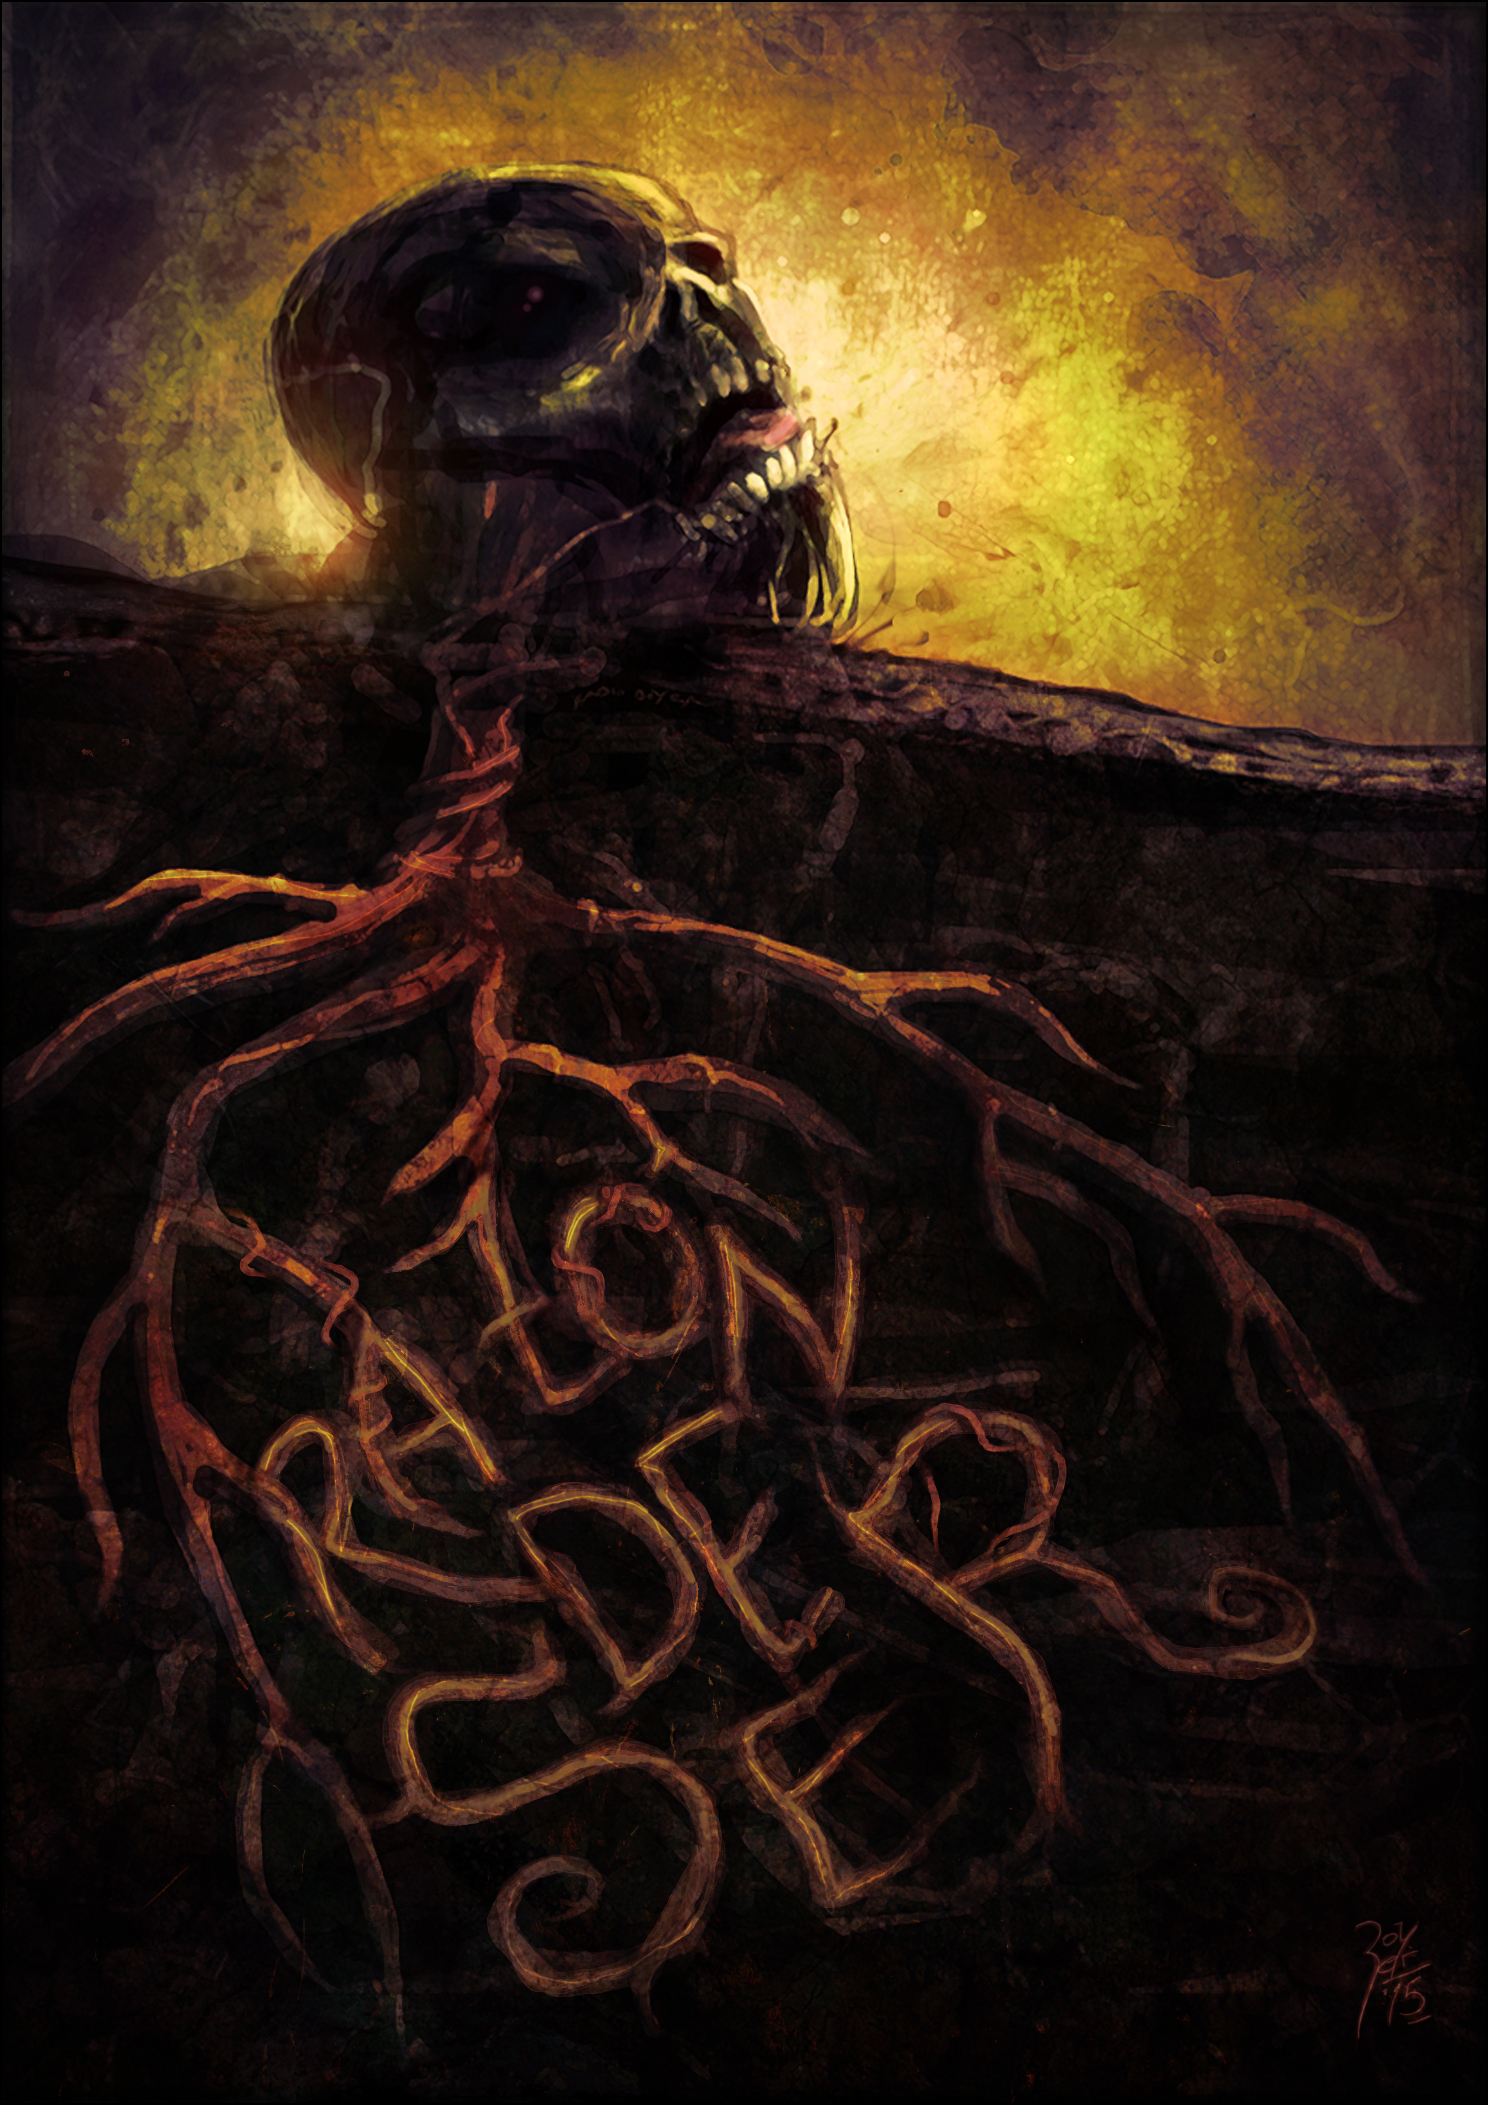 Old roots (Raison D'etre) by FAB-dark